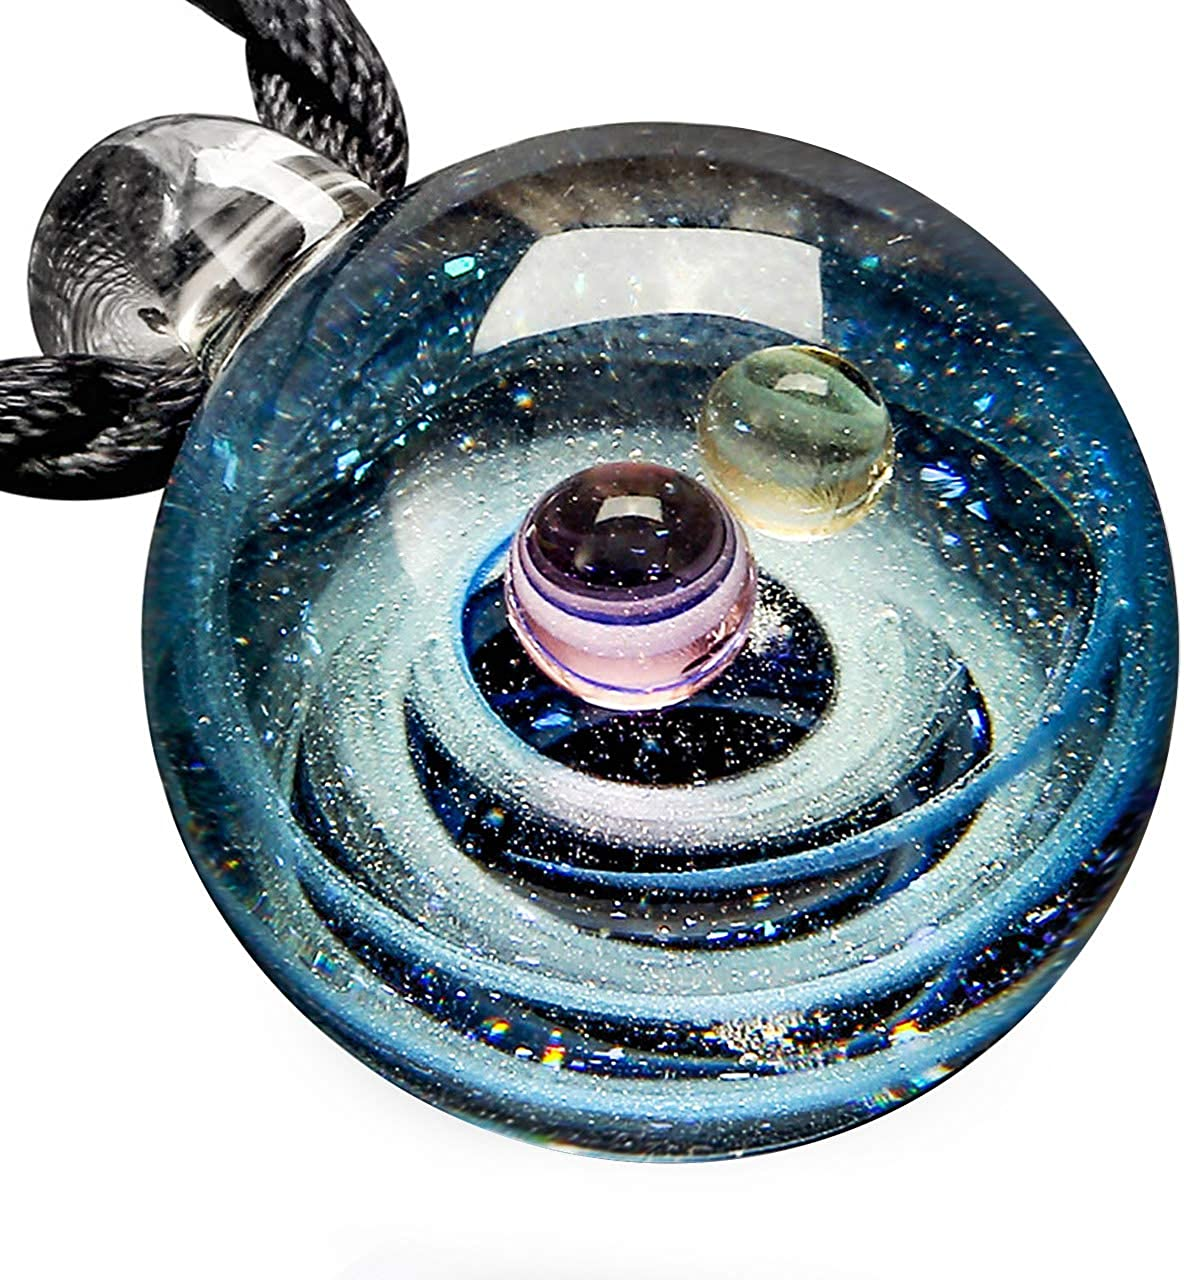 Dreamy Crystal Ball Star Short Glass Galaxy Pattern Pendant Necklace Jewelry HGU